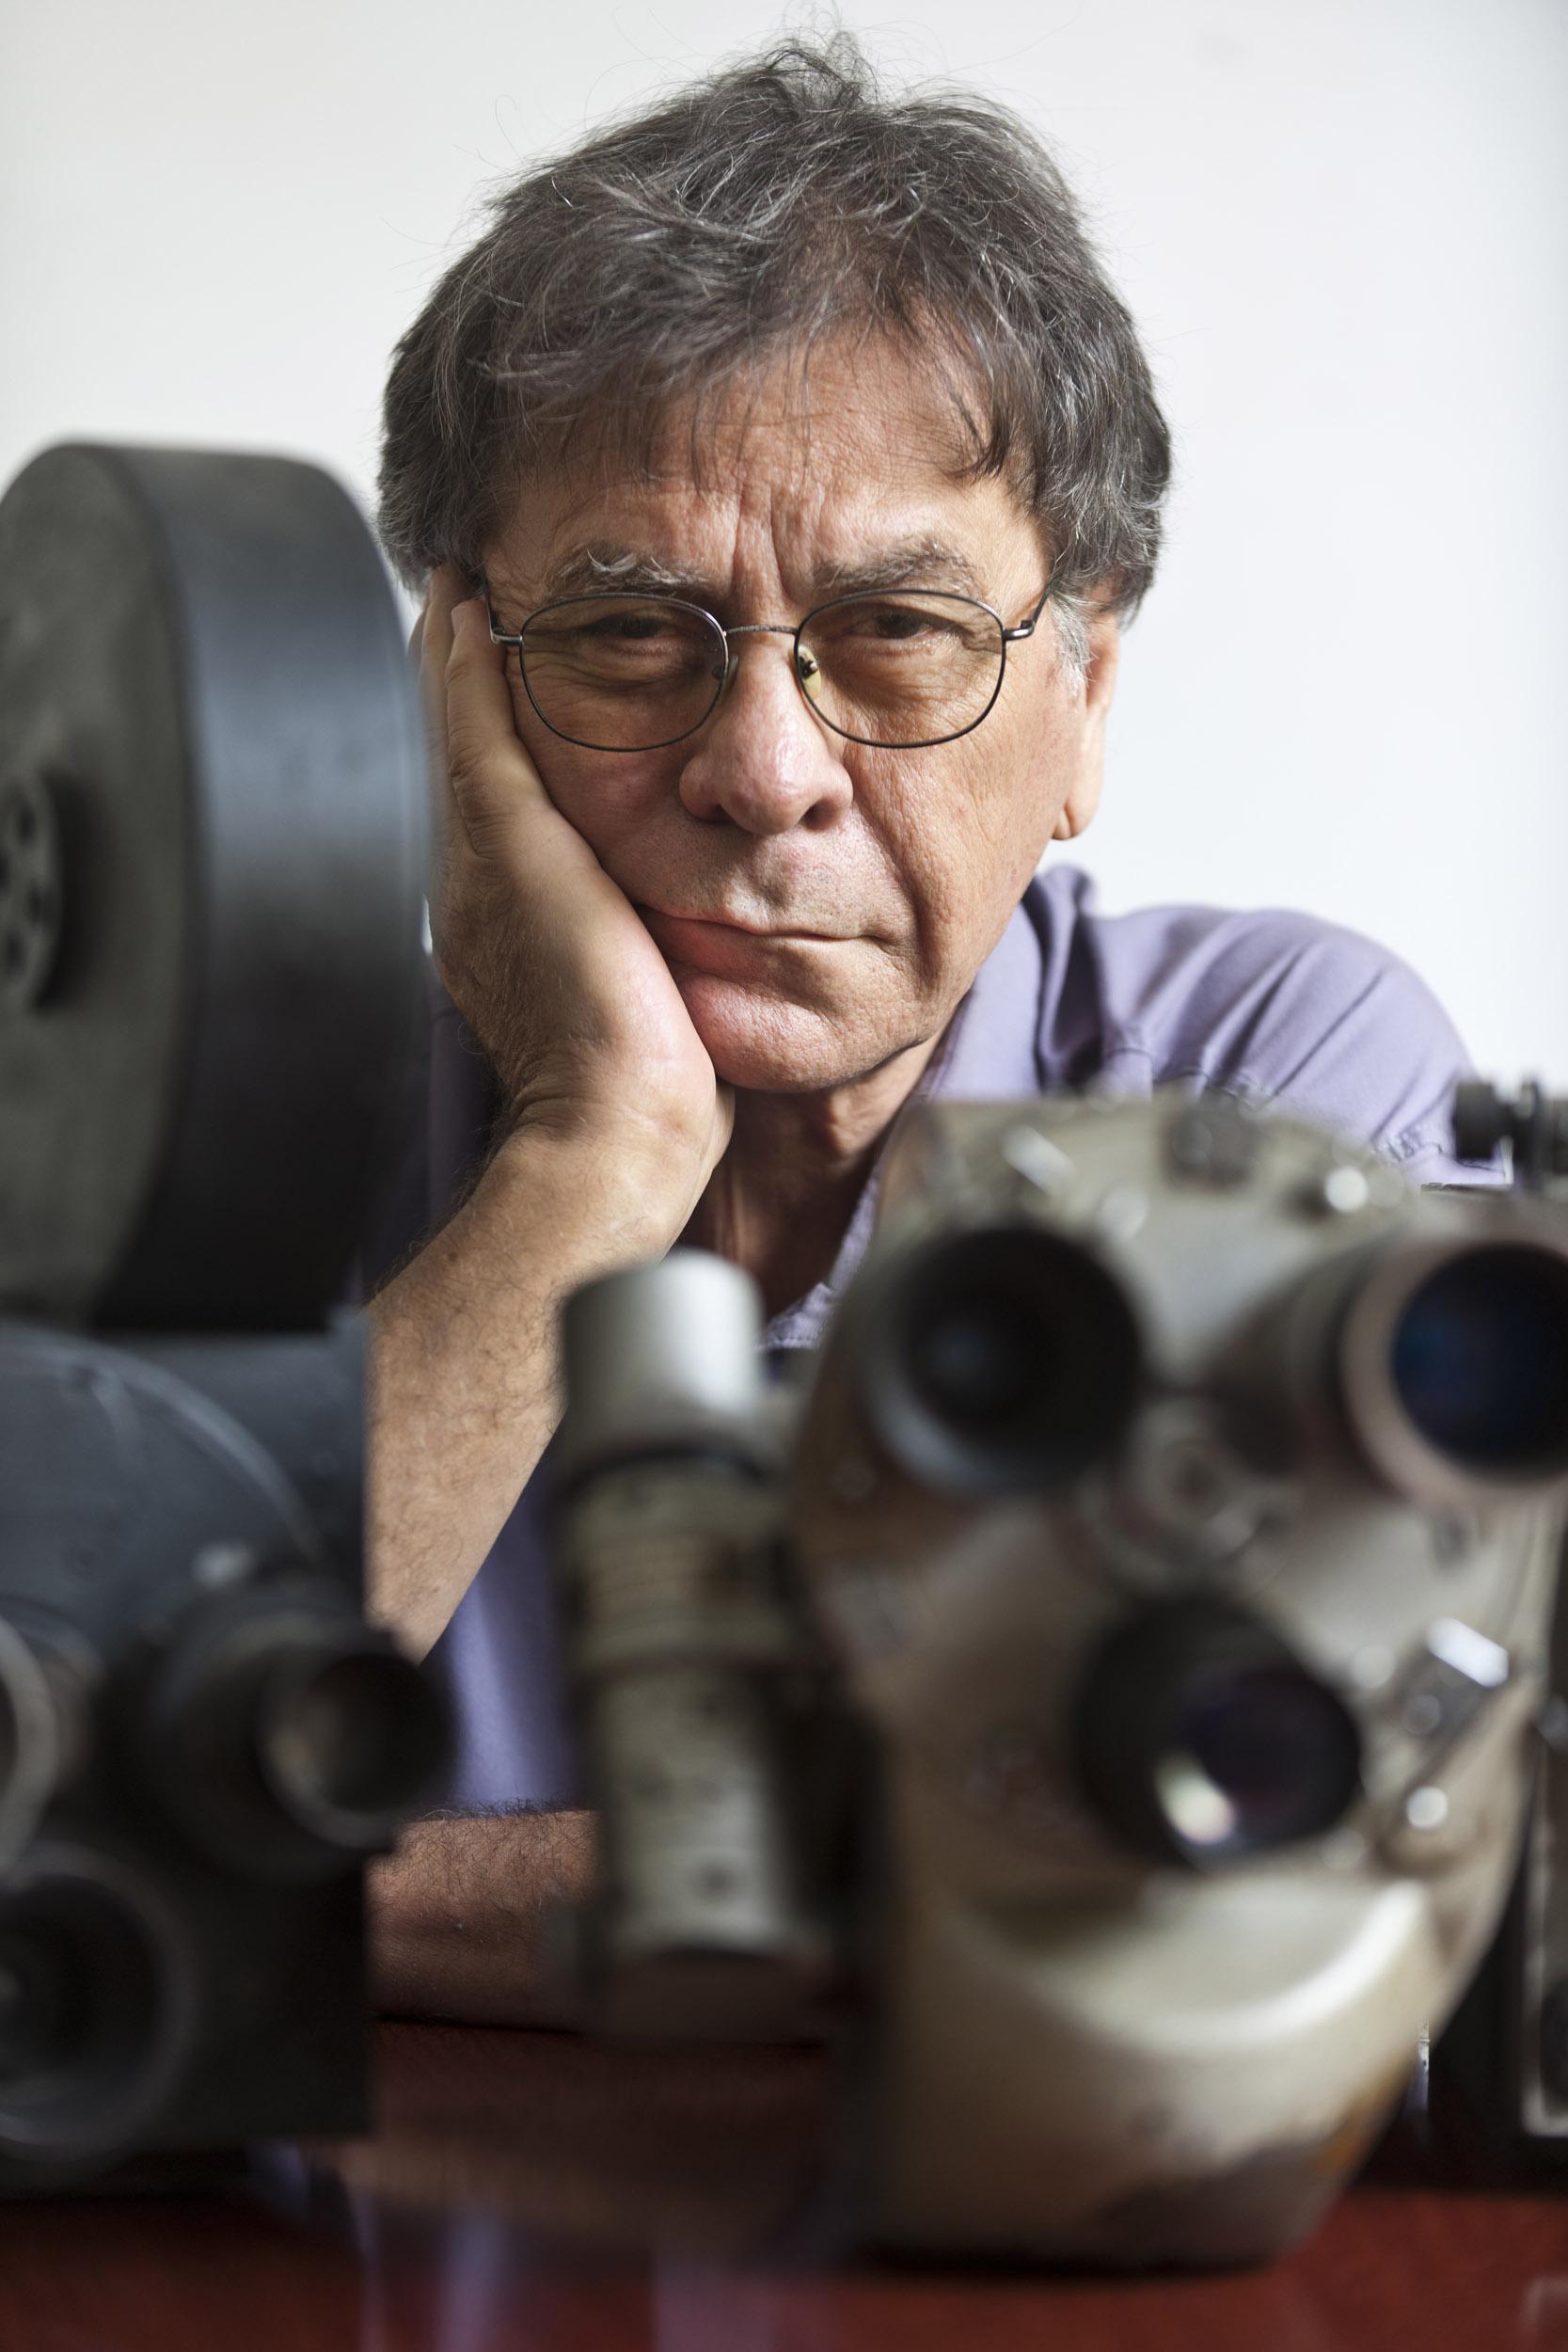 Raúl Pérez Ureta, photographer - Illuminated Cuba - Hector Garrido, Aerial and human photography